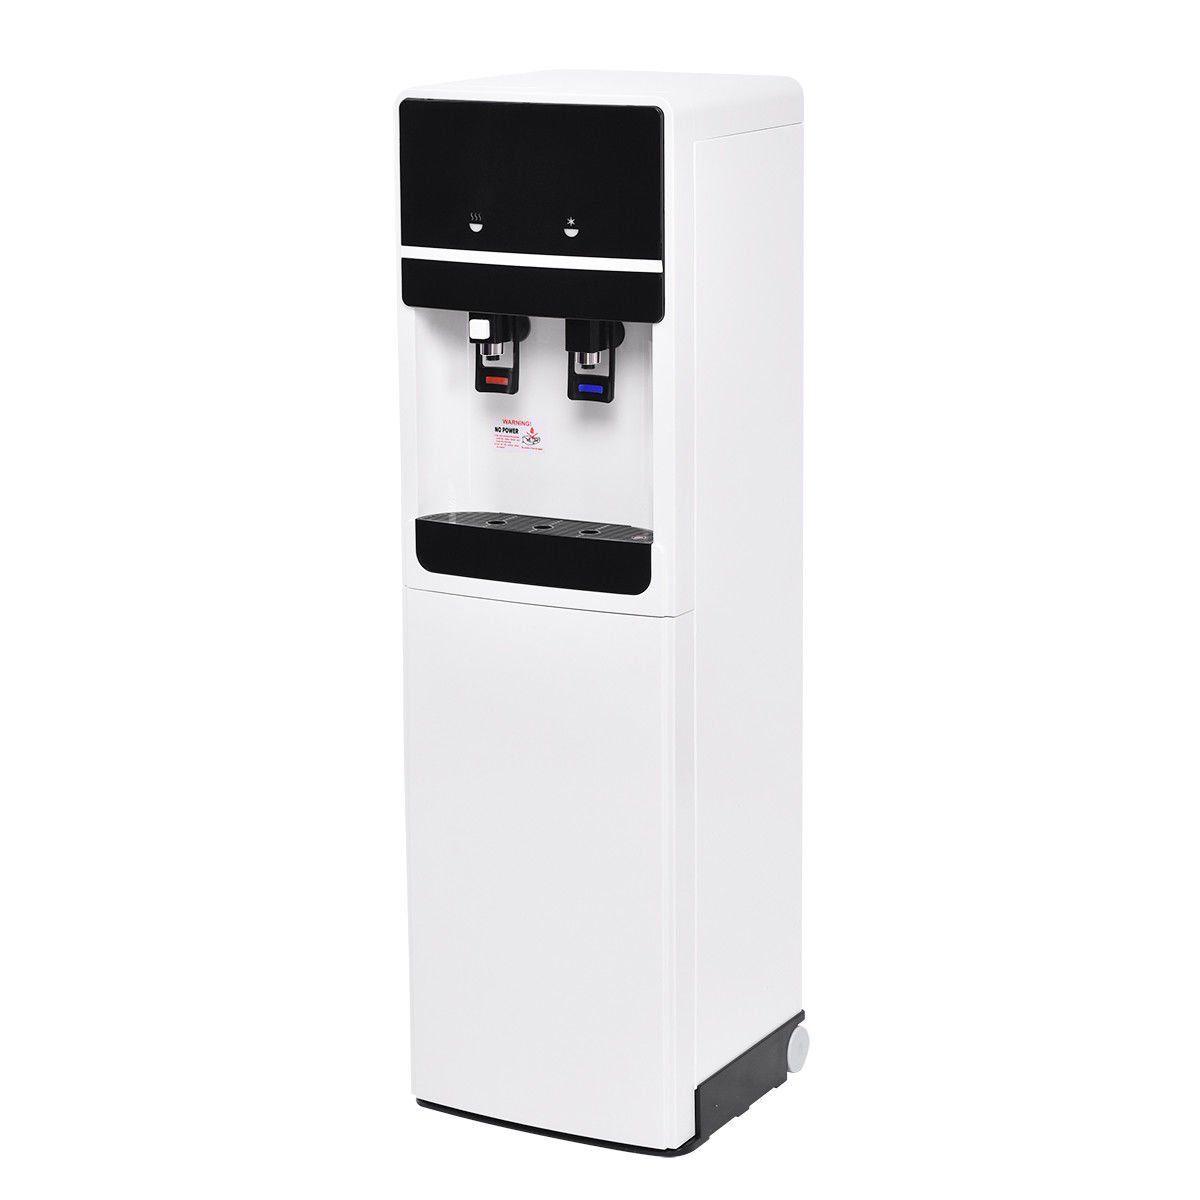 Costway Bottom Loading Water Cooler Dispenser Underlying Stainless ...